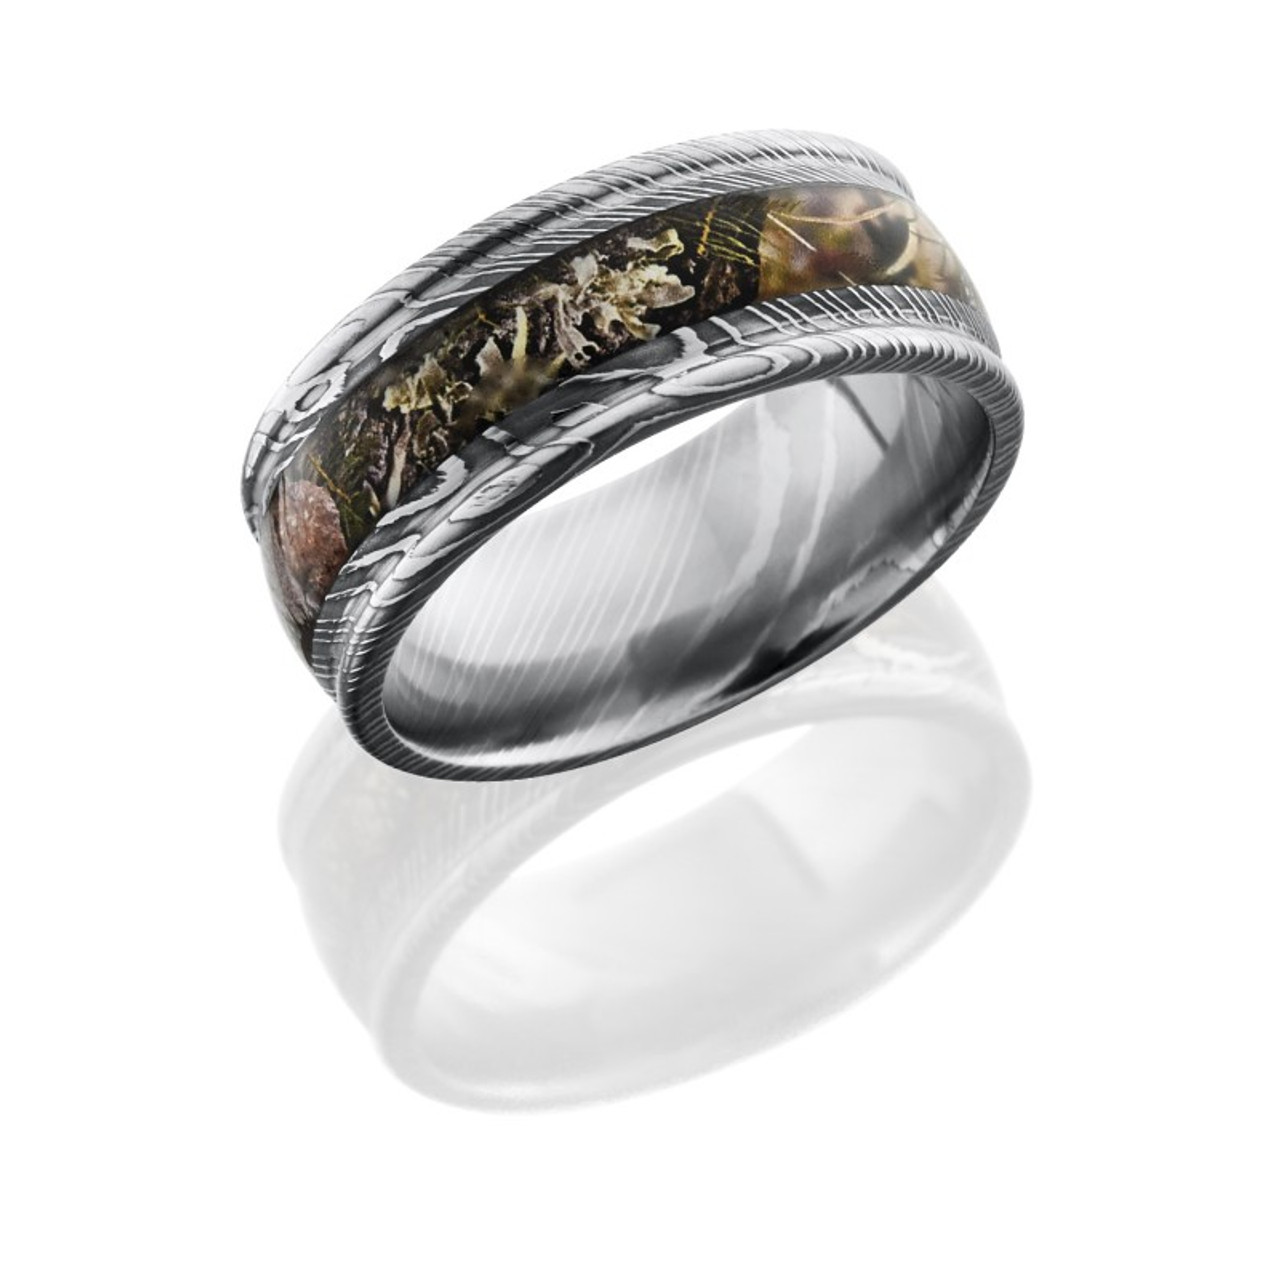 Rounded Edge Damascus Steel Camo Ring Camokix